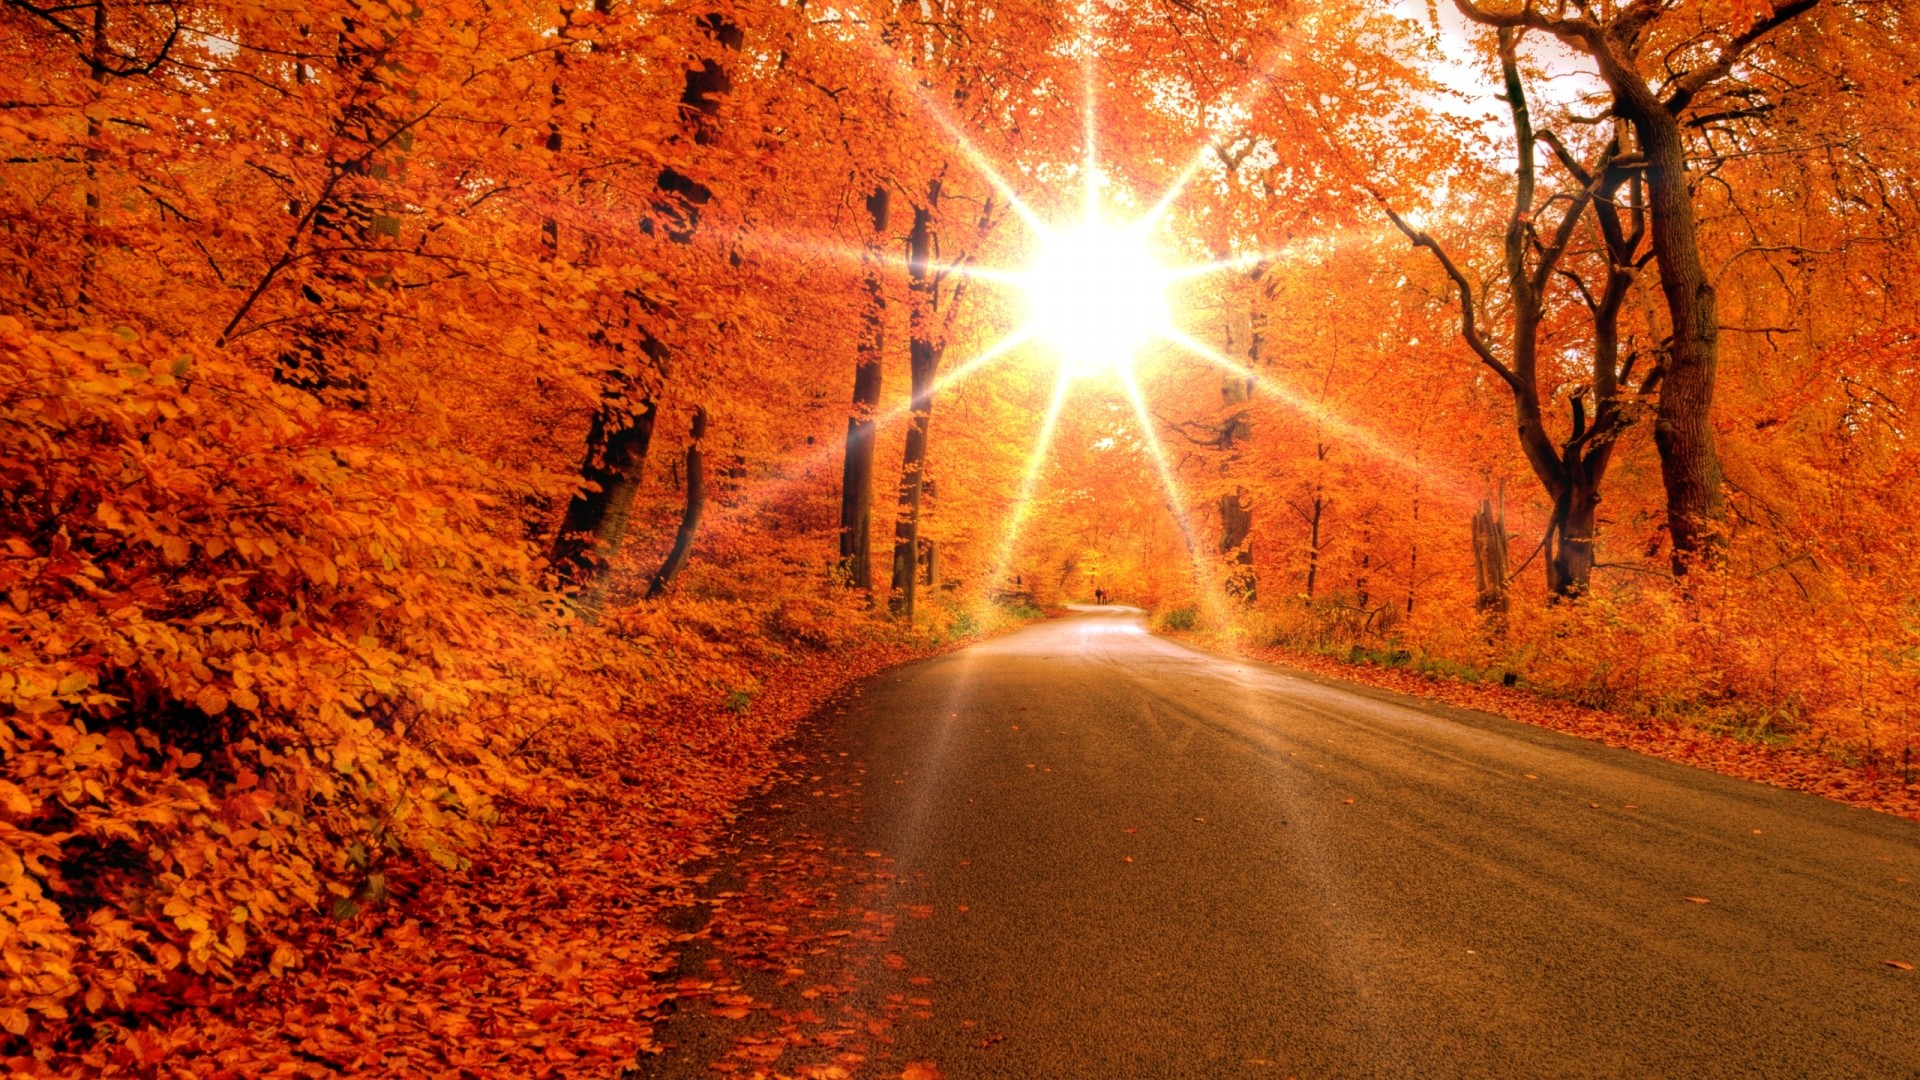 Beautiful Sunset On The Autumn Forest Wallpape #6762 Wallpaper .